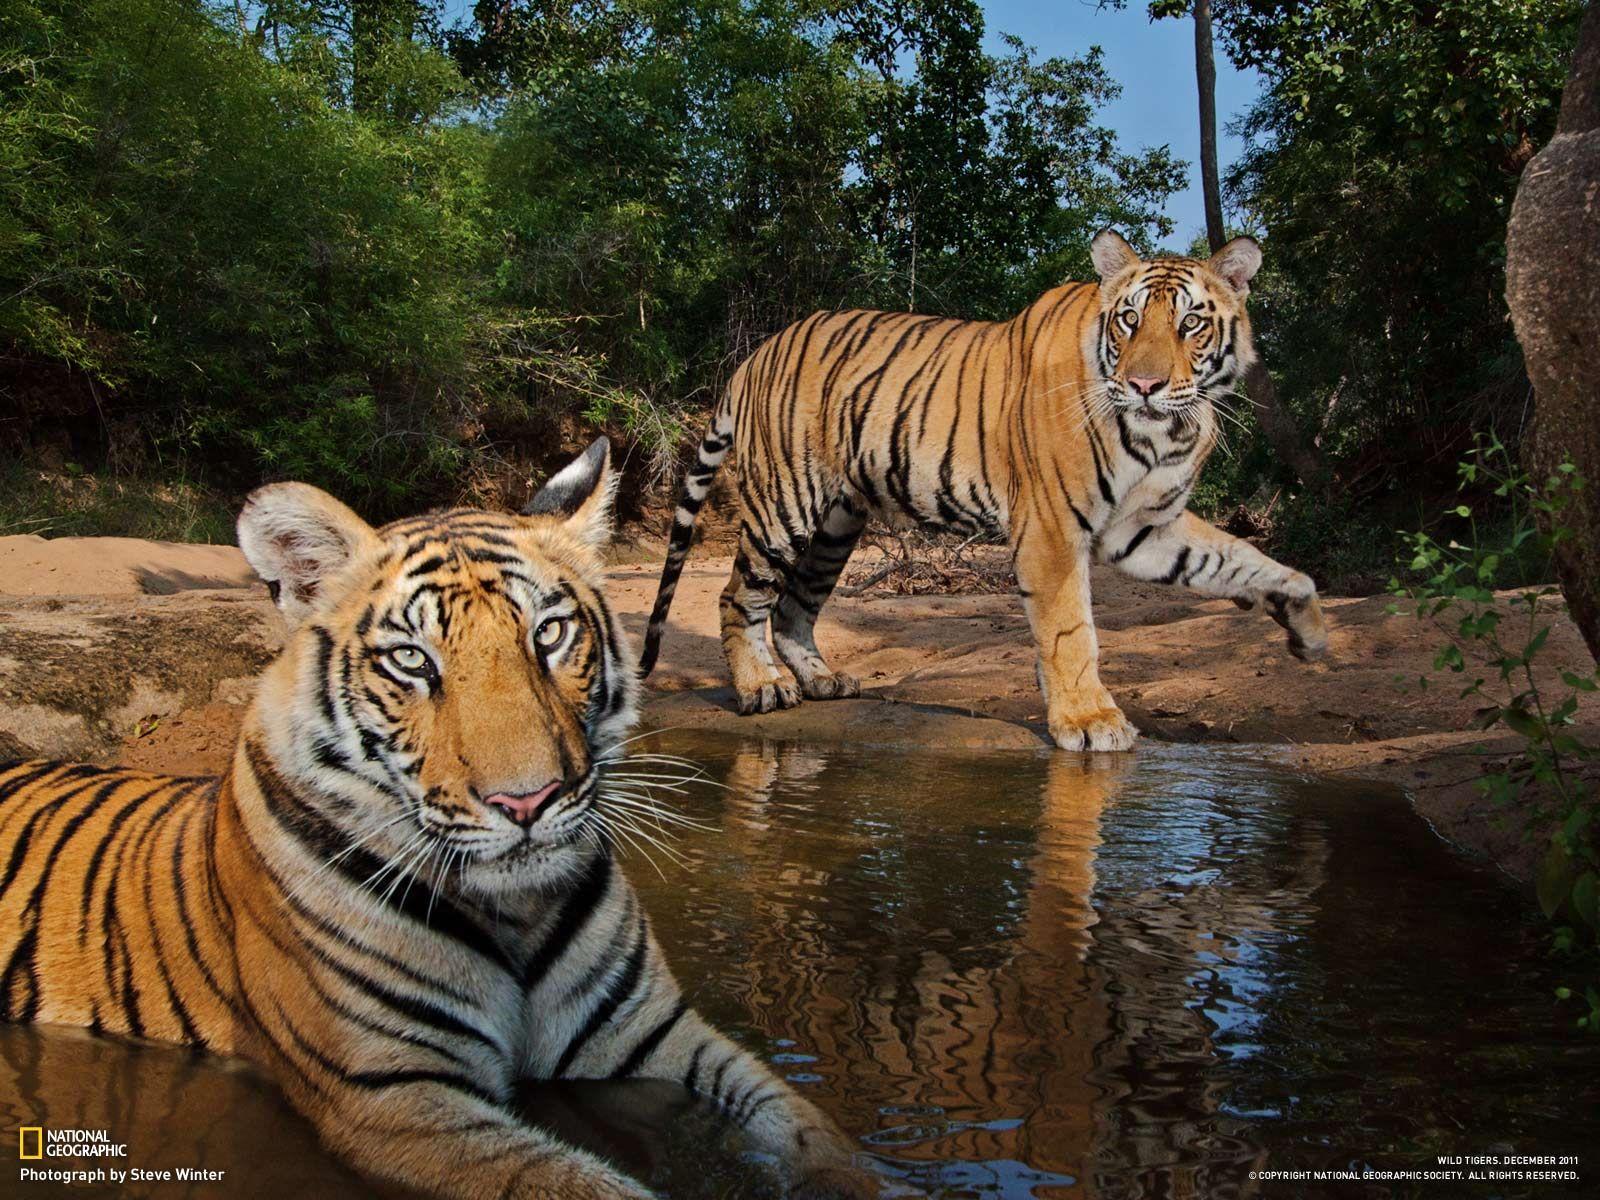 National geographic wild animals download wallpaper - National geographic wild wallpapers ...